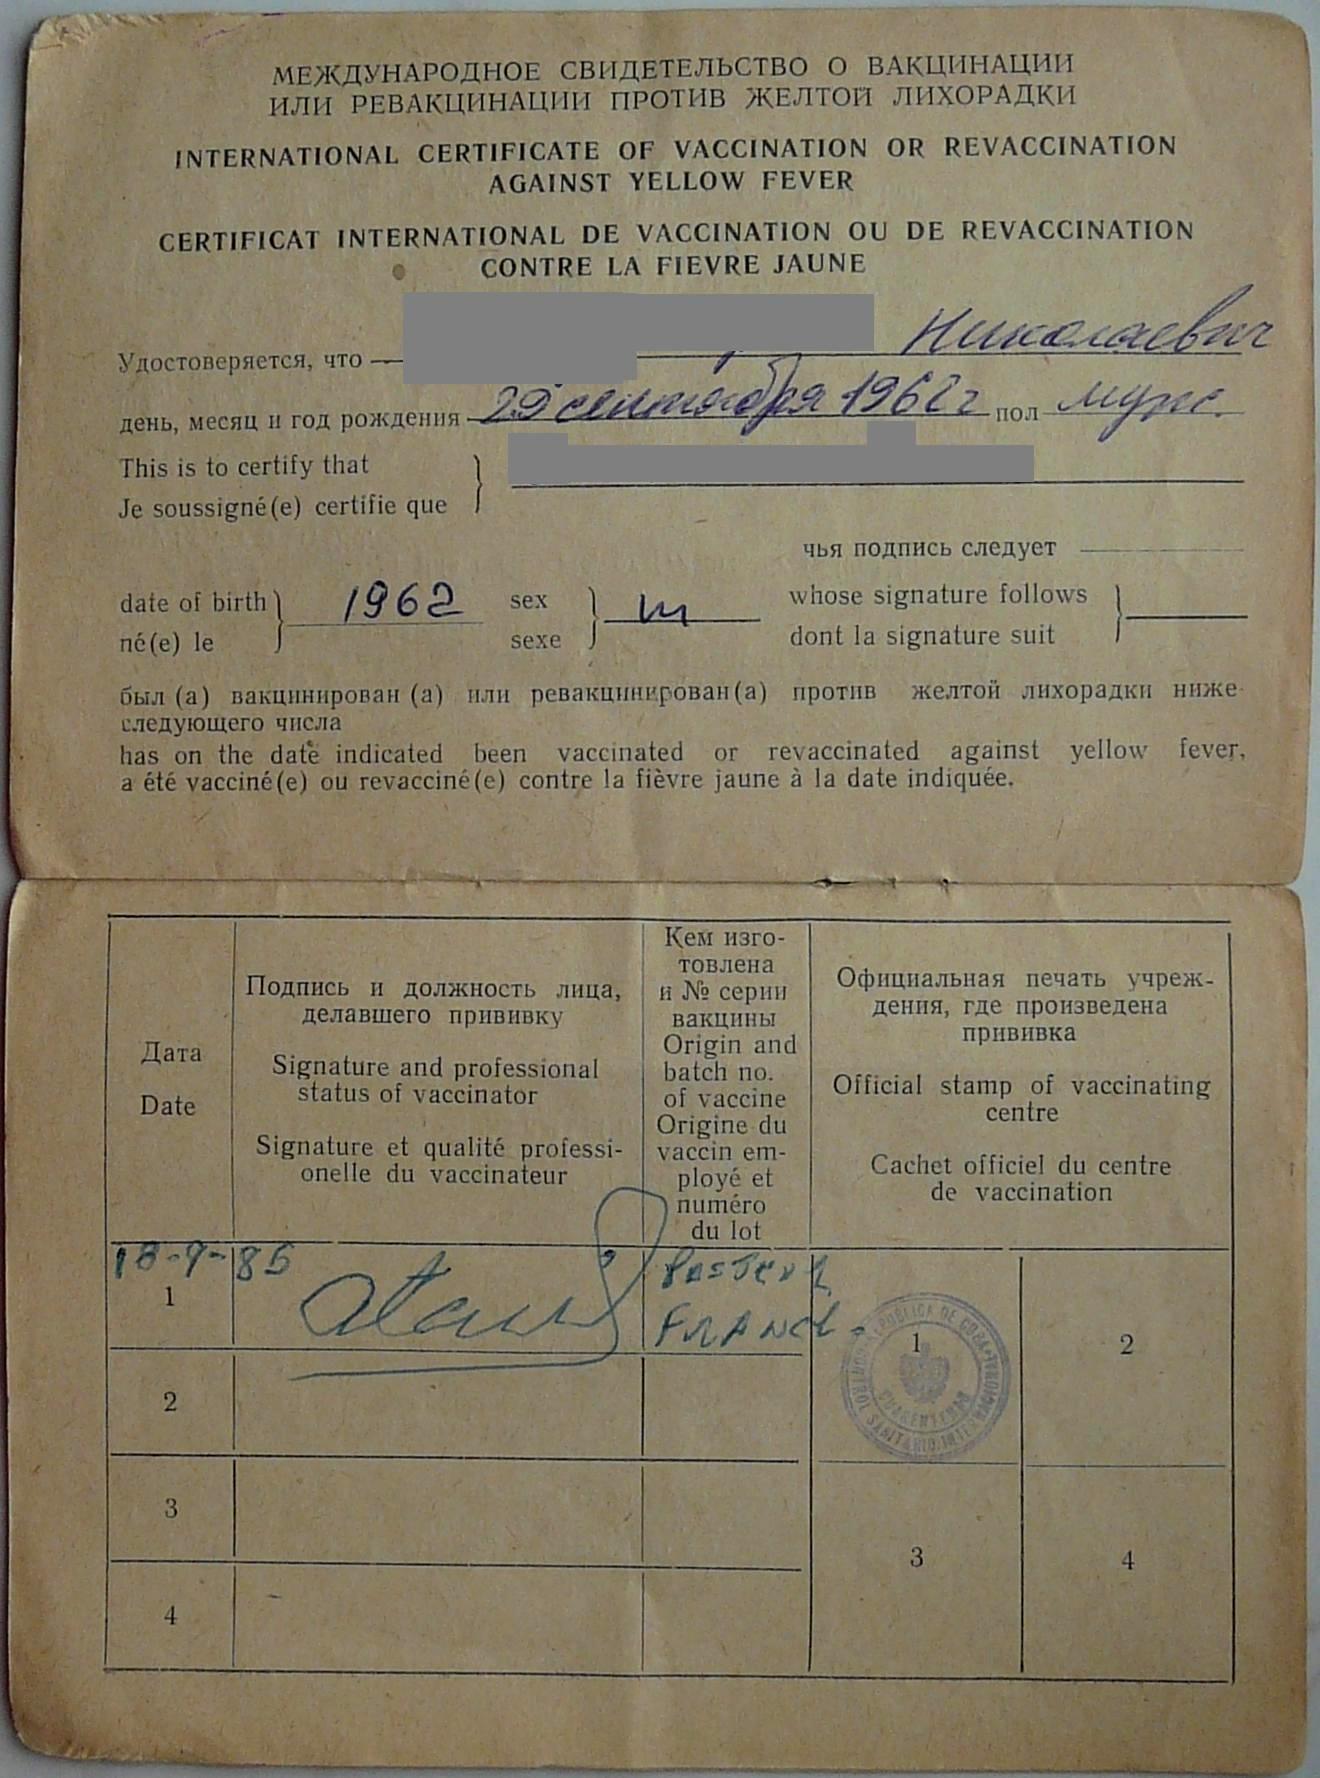 Soviet_International_Certificate_of_Vaccination_or_Revaccination_Against_Yello_Fever.jpg